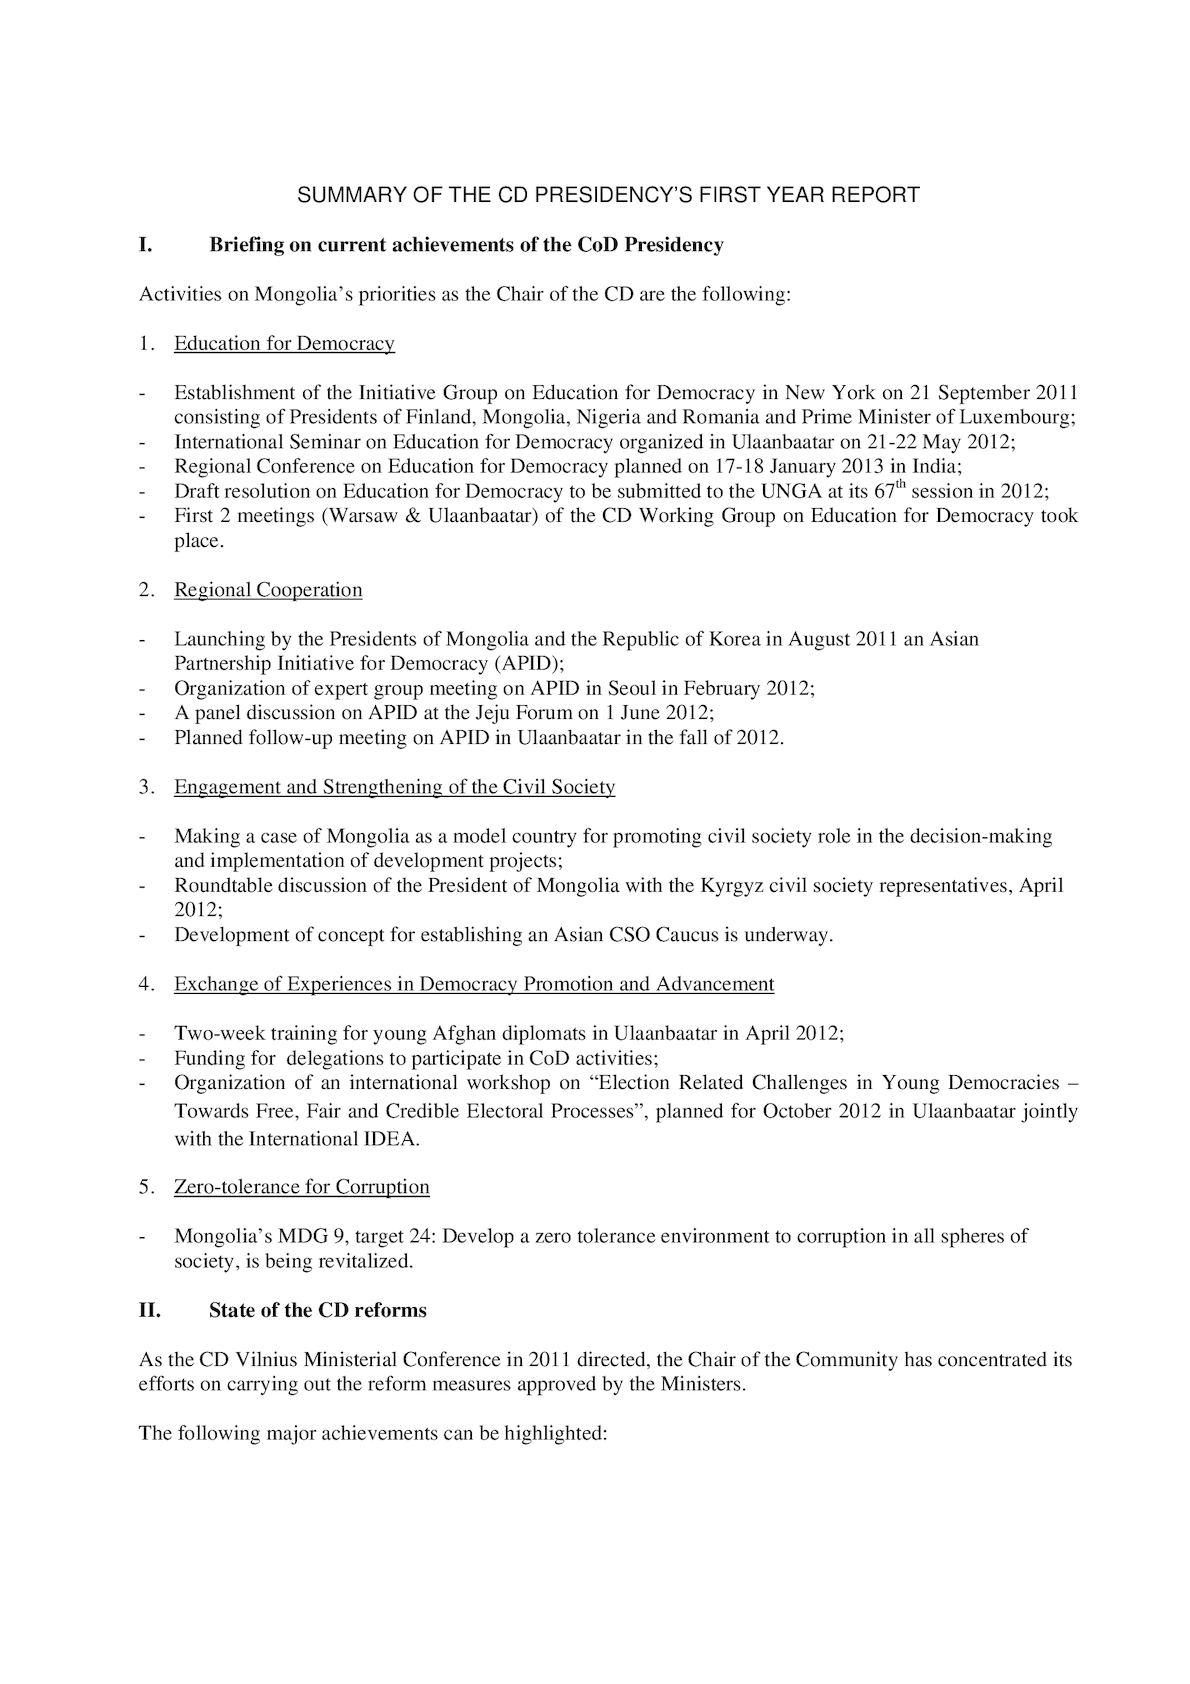 4th GC Meeting_(6) Summary Of Presidency's Activities